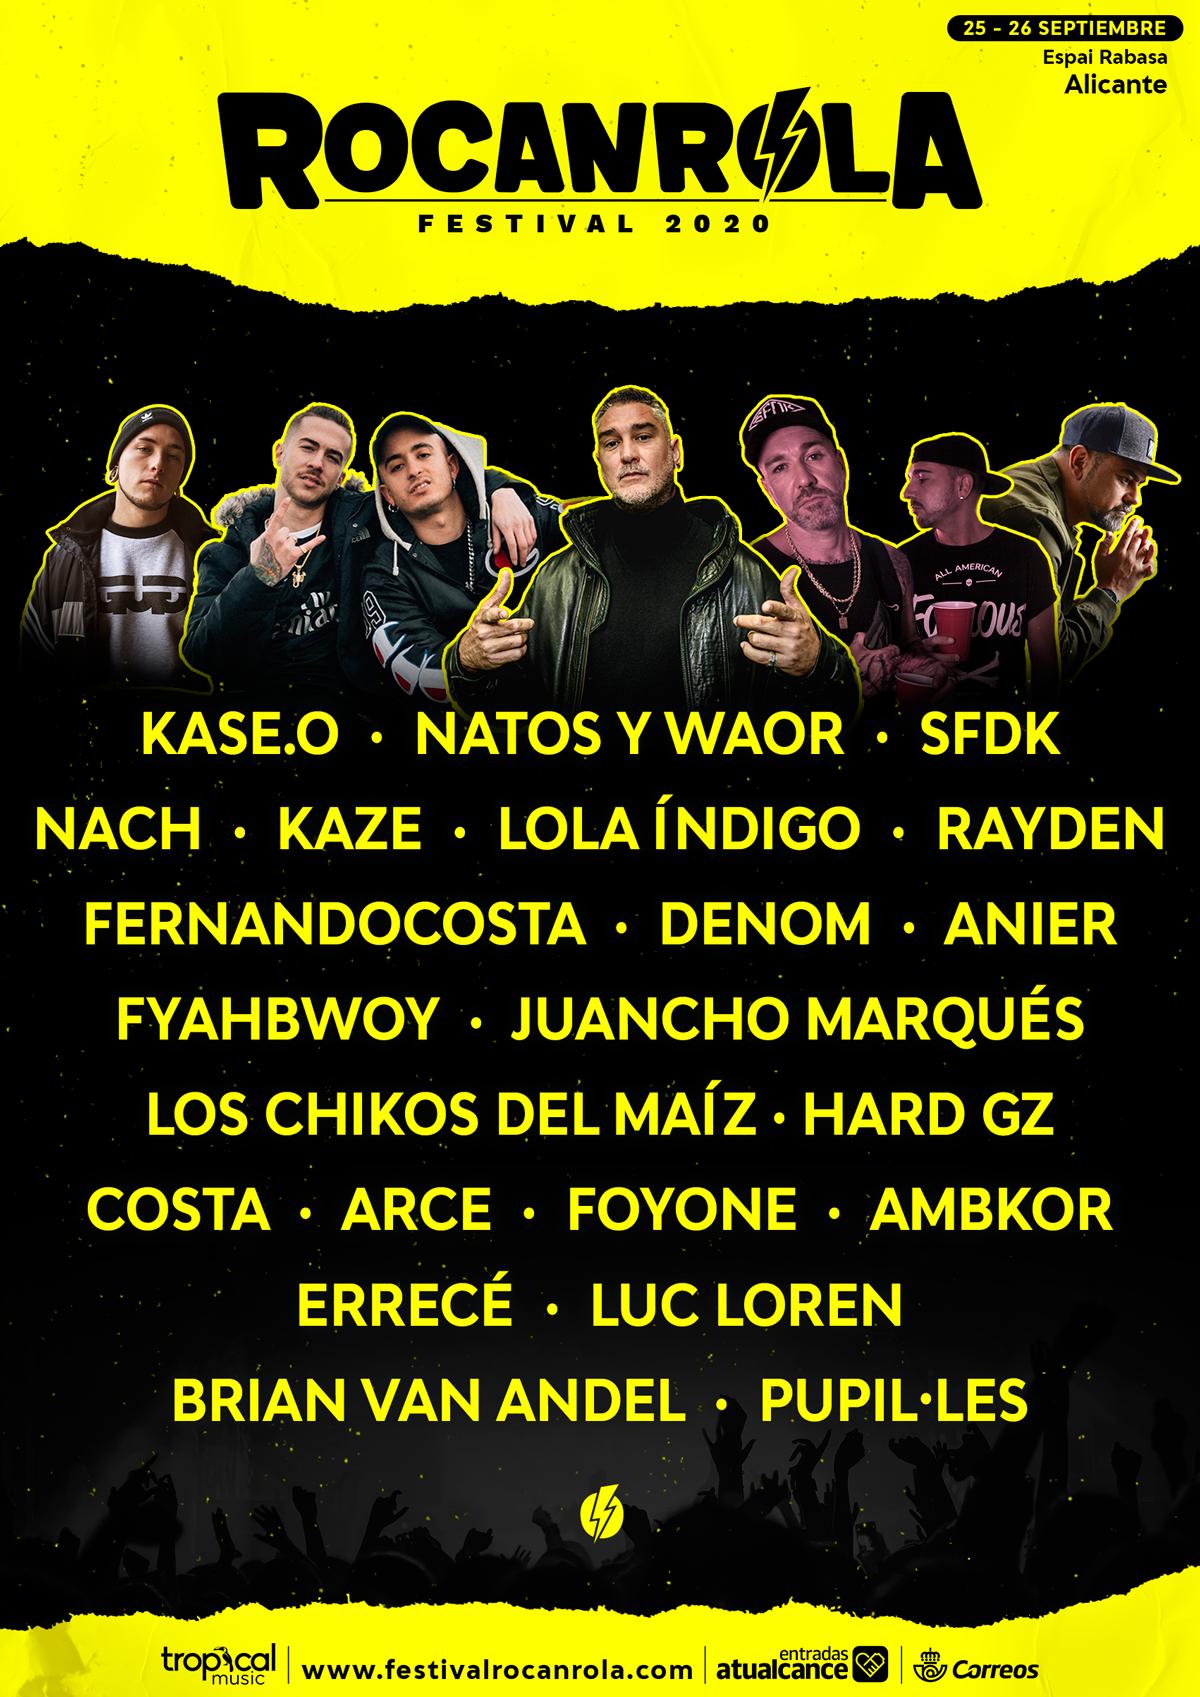 festival-rocanrola-5e845aac74865.png